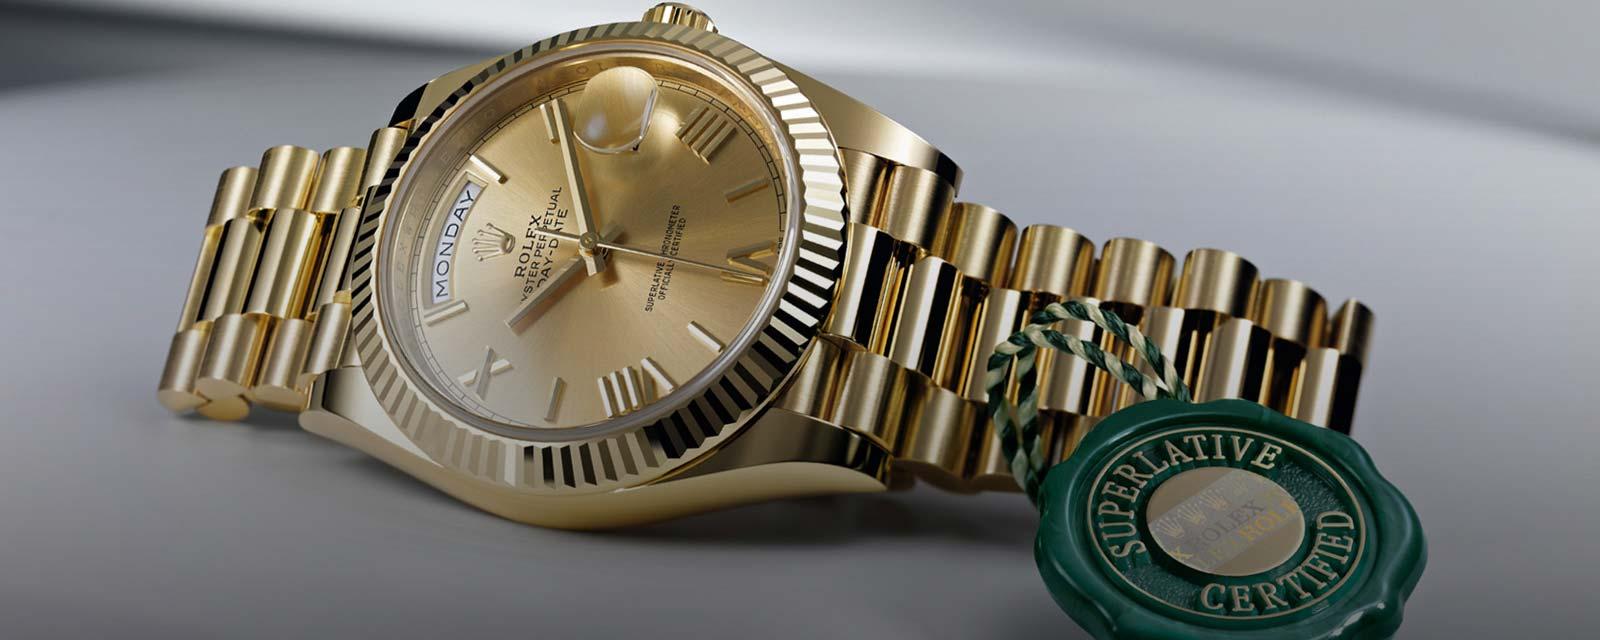 Atelier Stoess Rolex Fachhändler